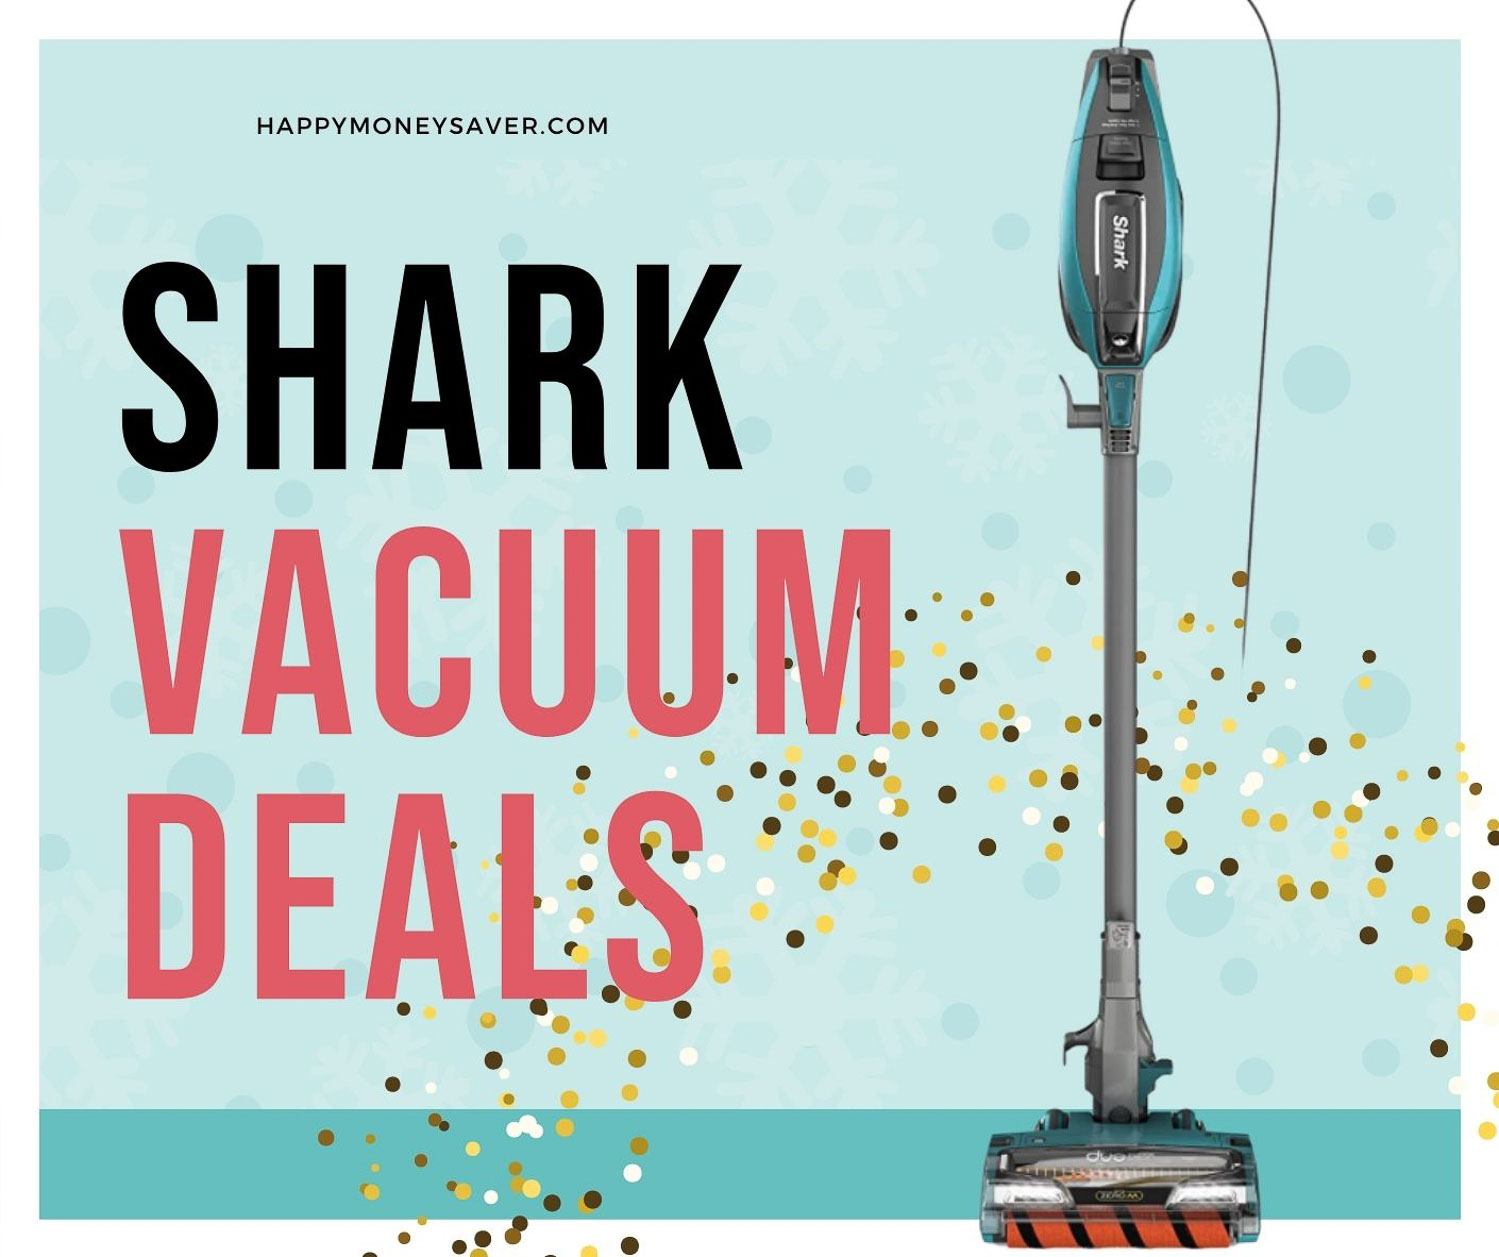 shark vacuum deals for black friday